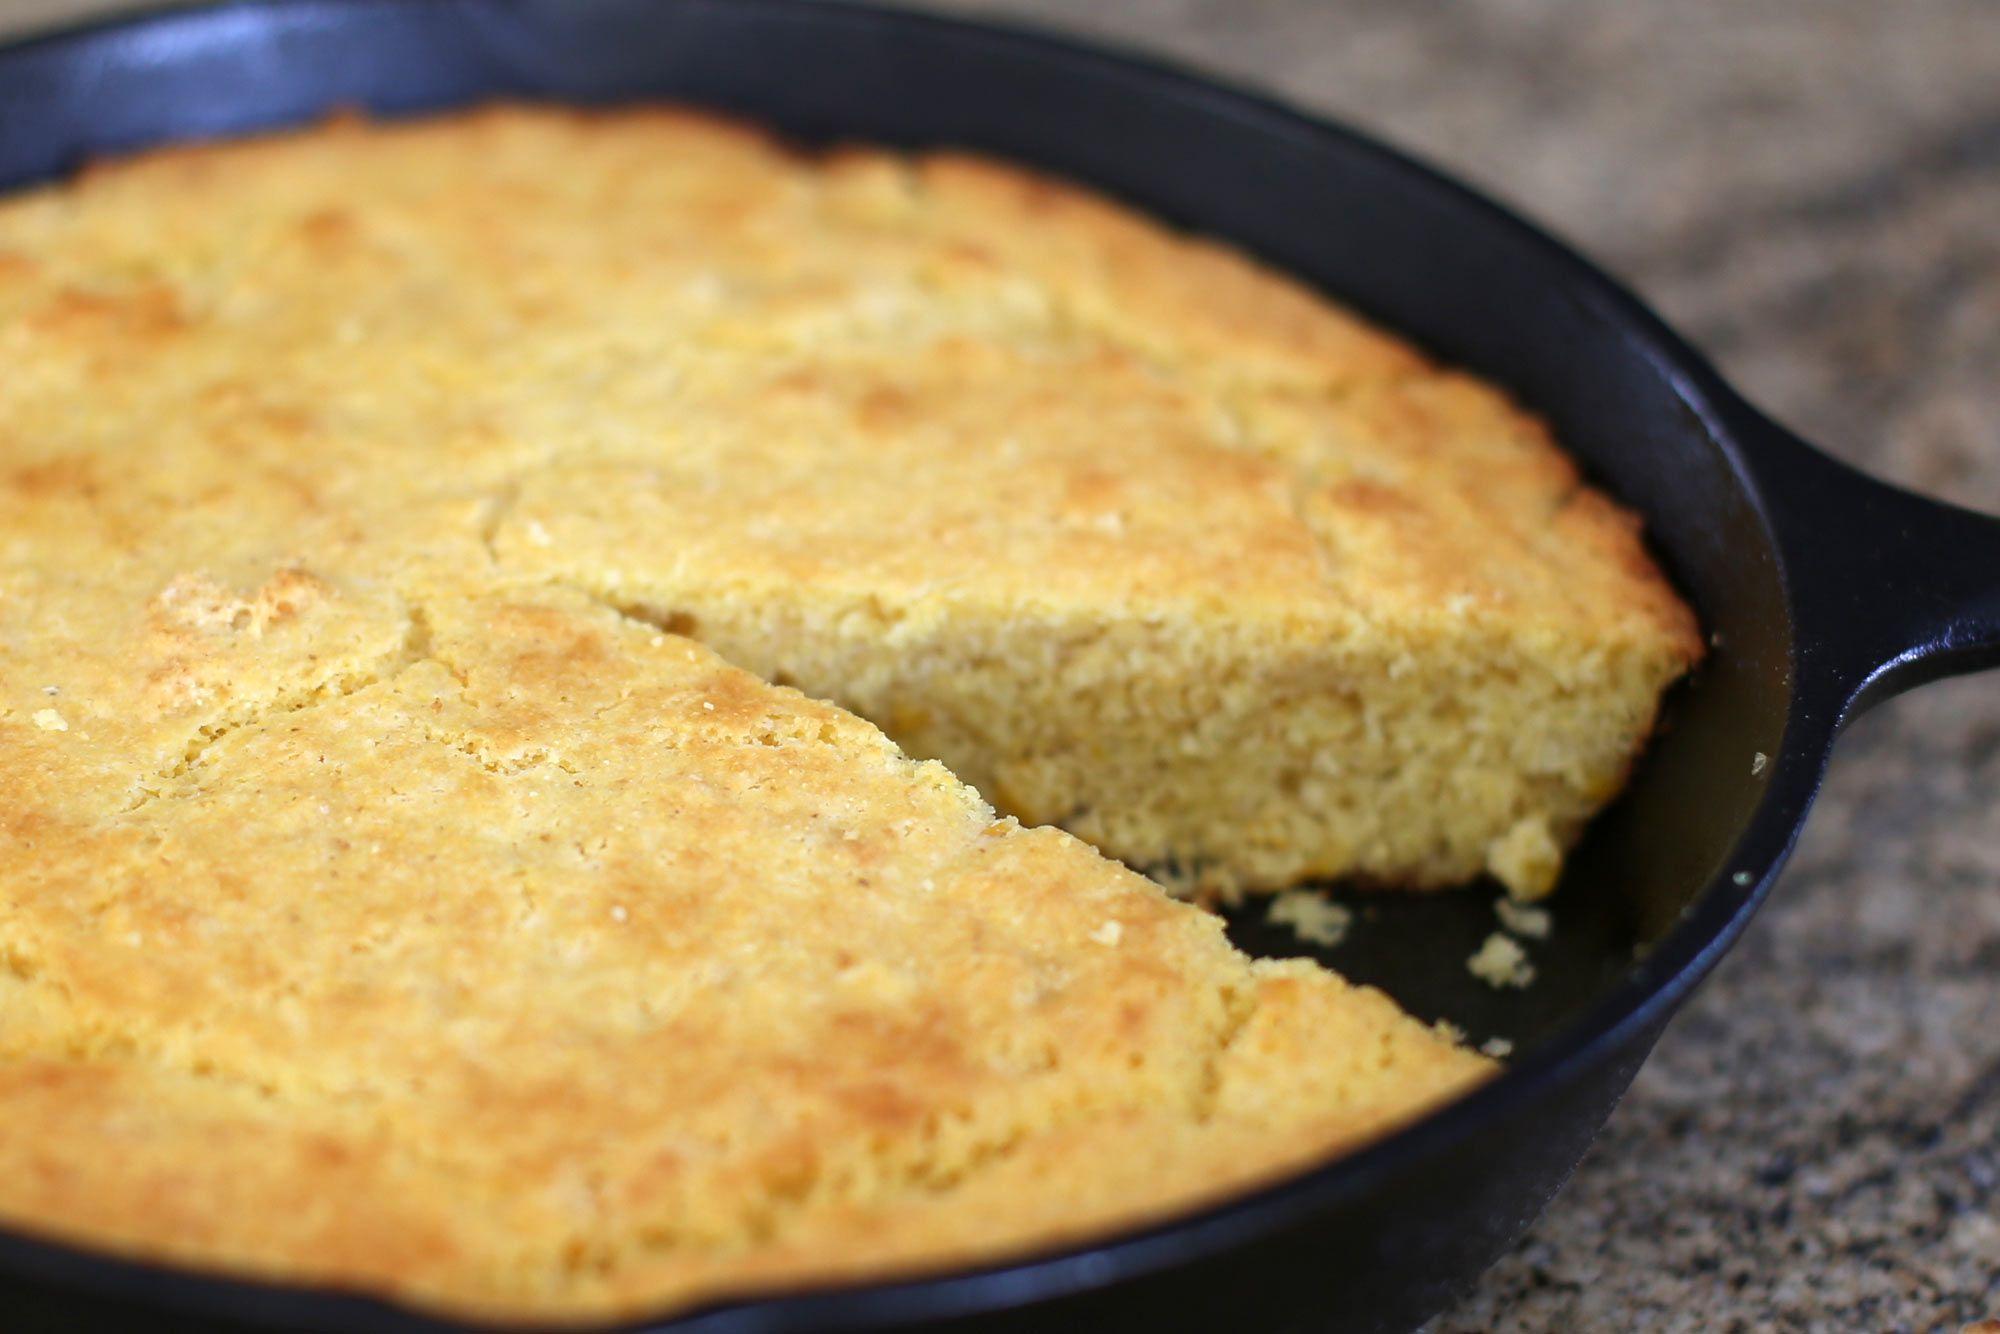 Homemade Self-Rising Cornmeal Mix for Cornbread